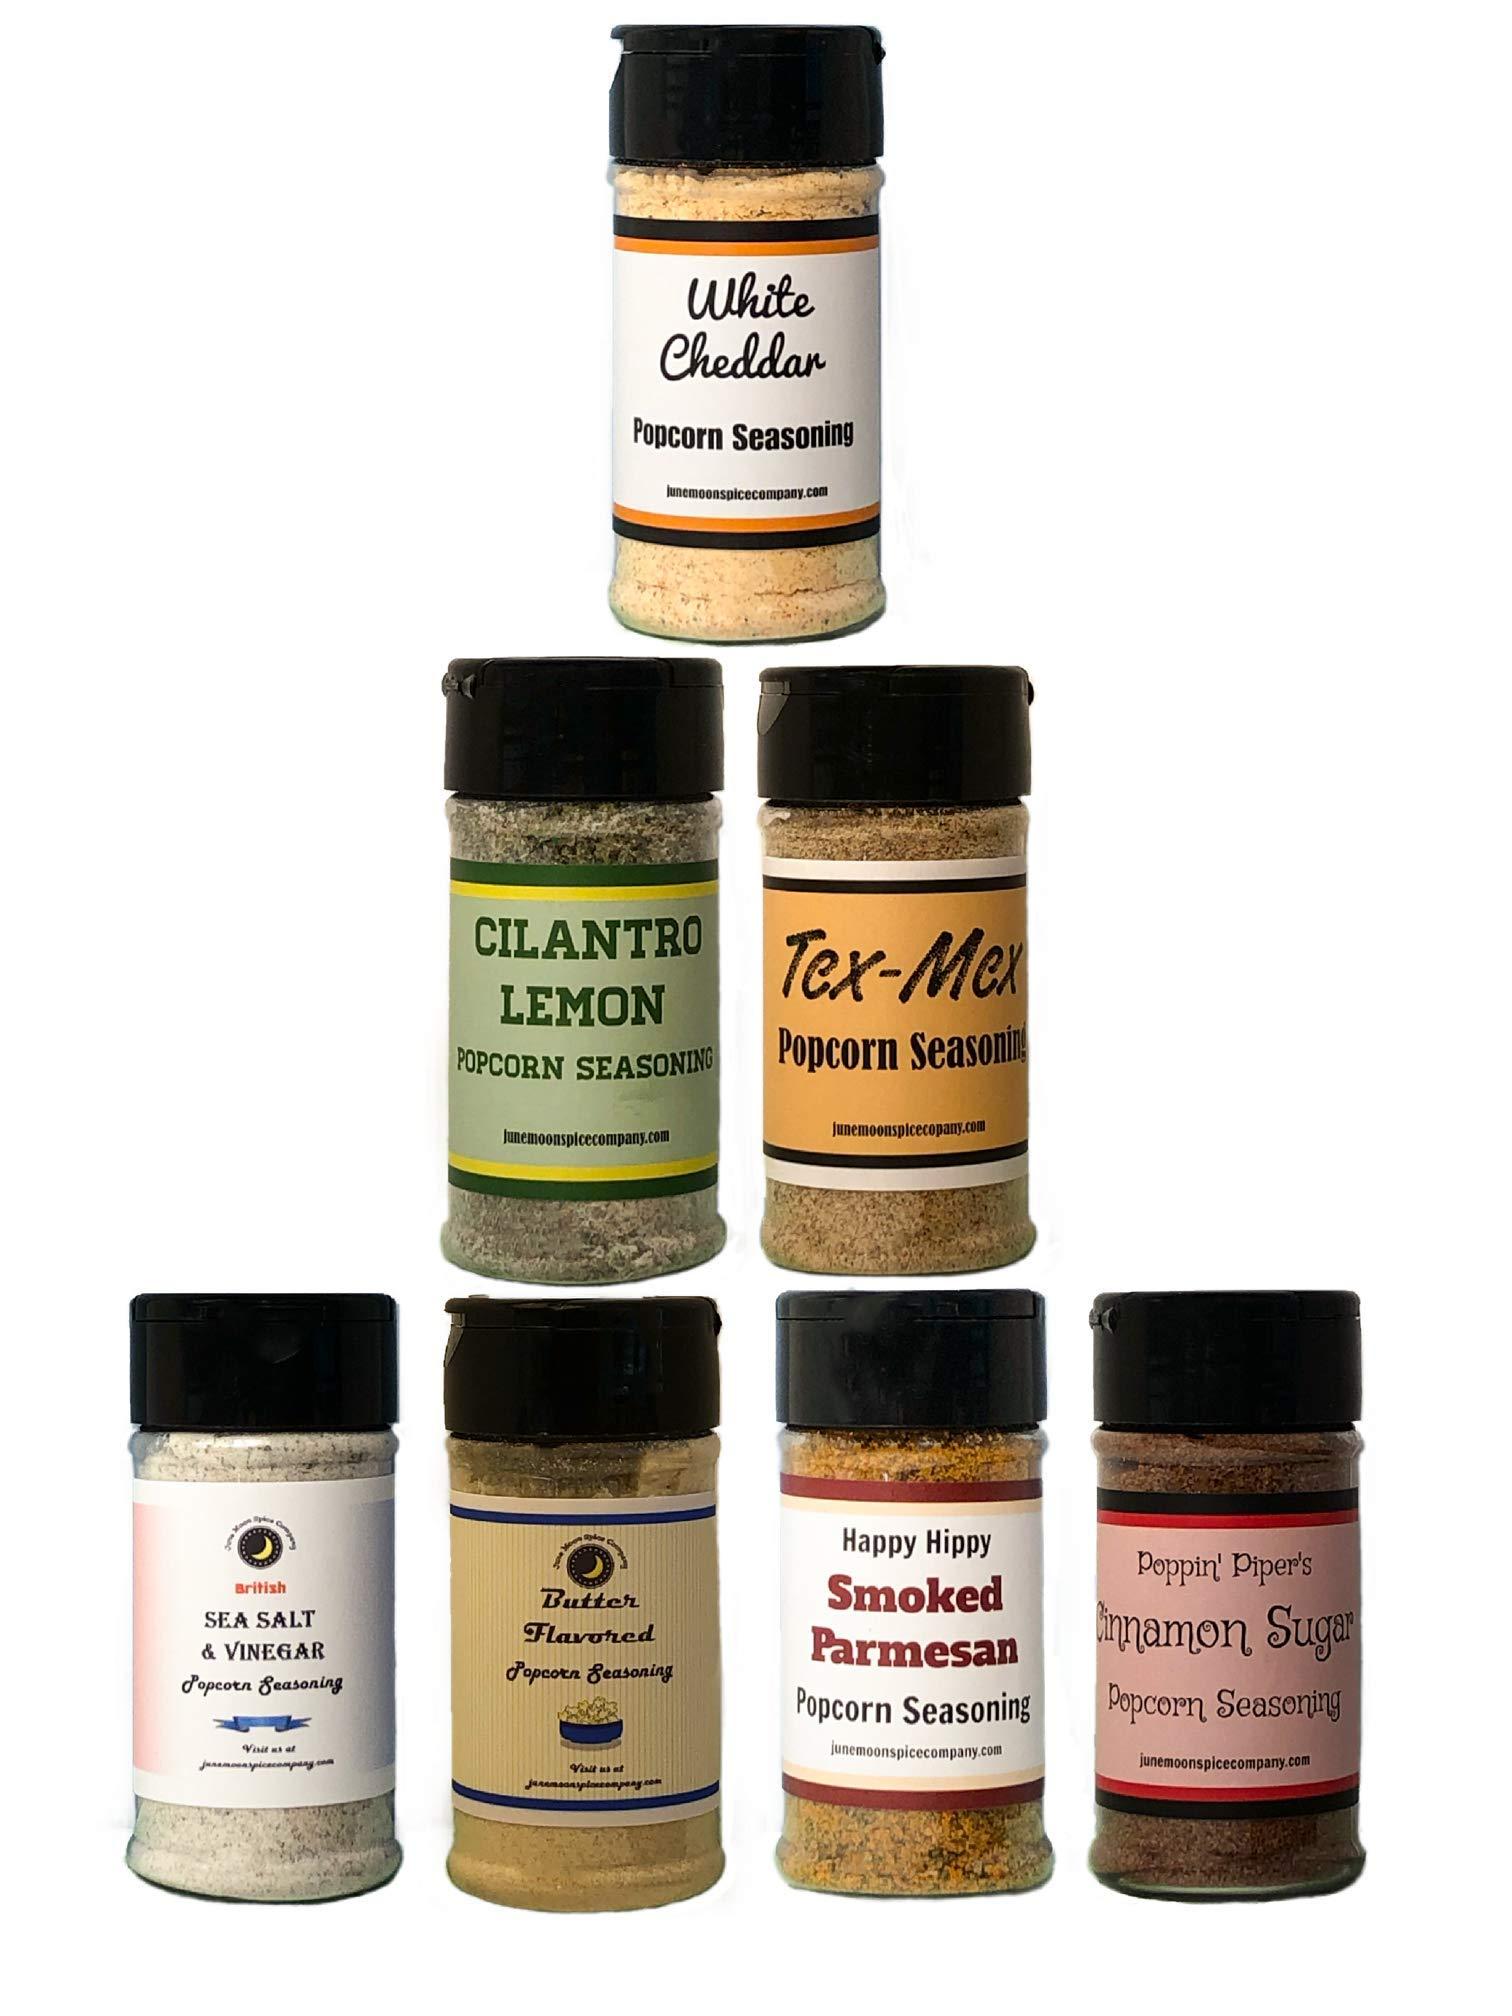 PREMIUM | Popcorn Seasoning | Variety 7 Pack | Sea Salt & Vinegar | Butter | Smoked Parmesan | Cinnamon Sugar | Cilantro Lemon | Tex Mex | White Cheddar | 3.5 fl. oz.